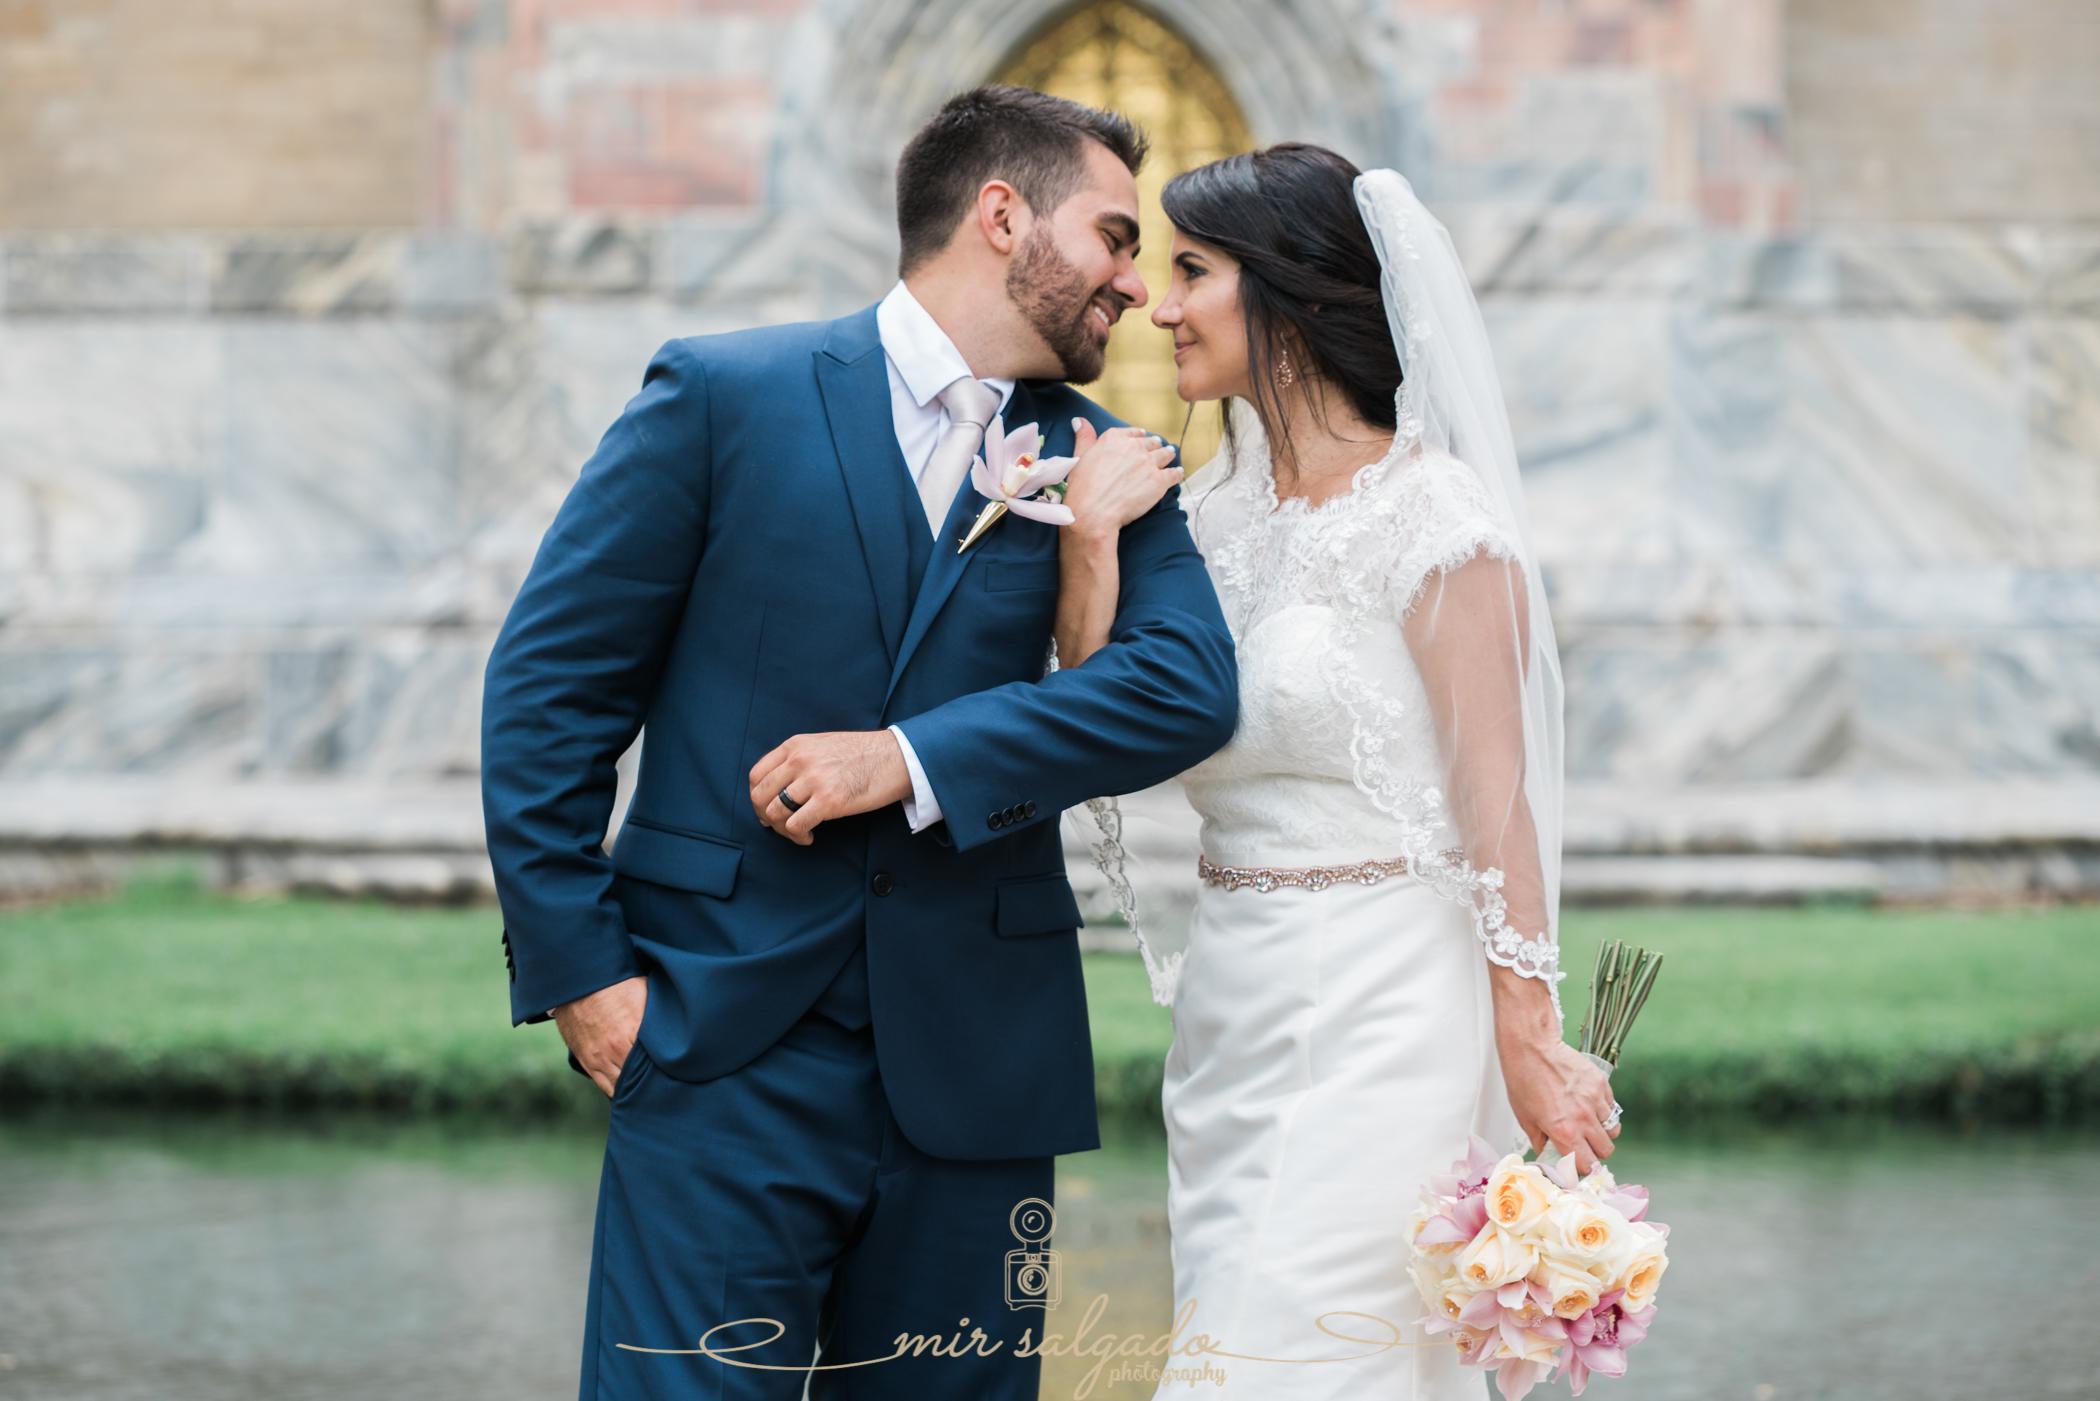 Bok-tower-gardens-wedding-day, Bride-and-groom-photo, Bok-tower